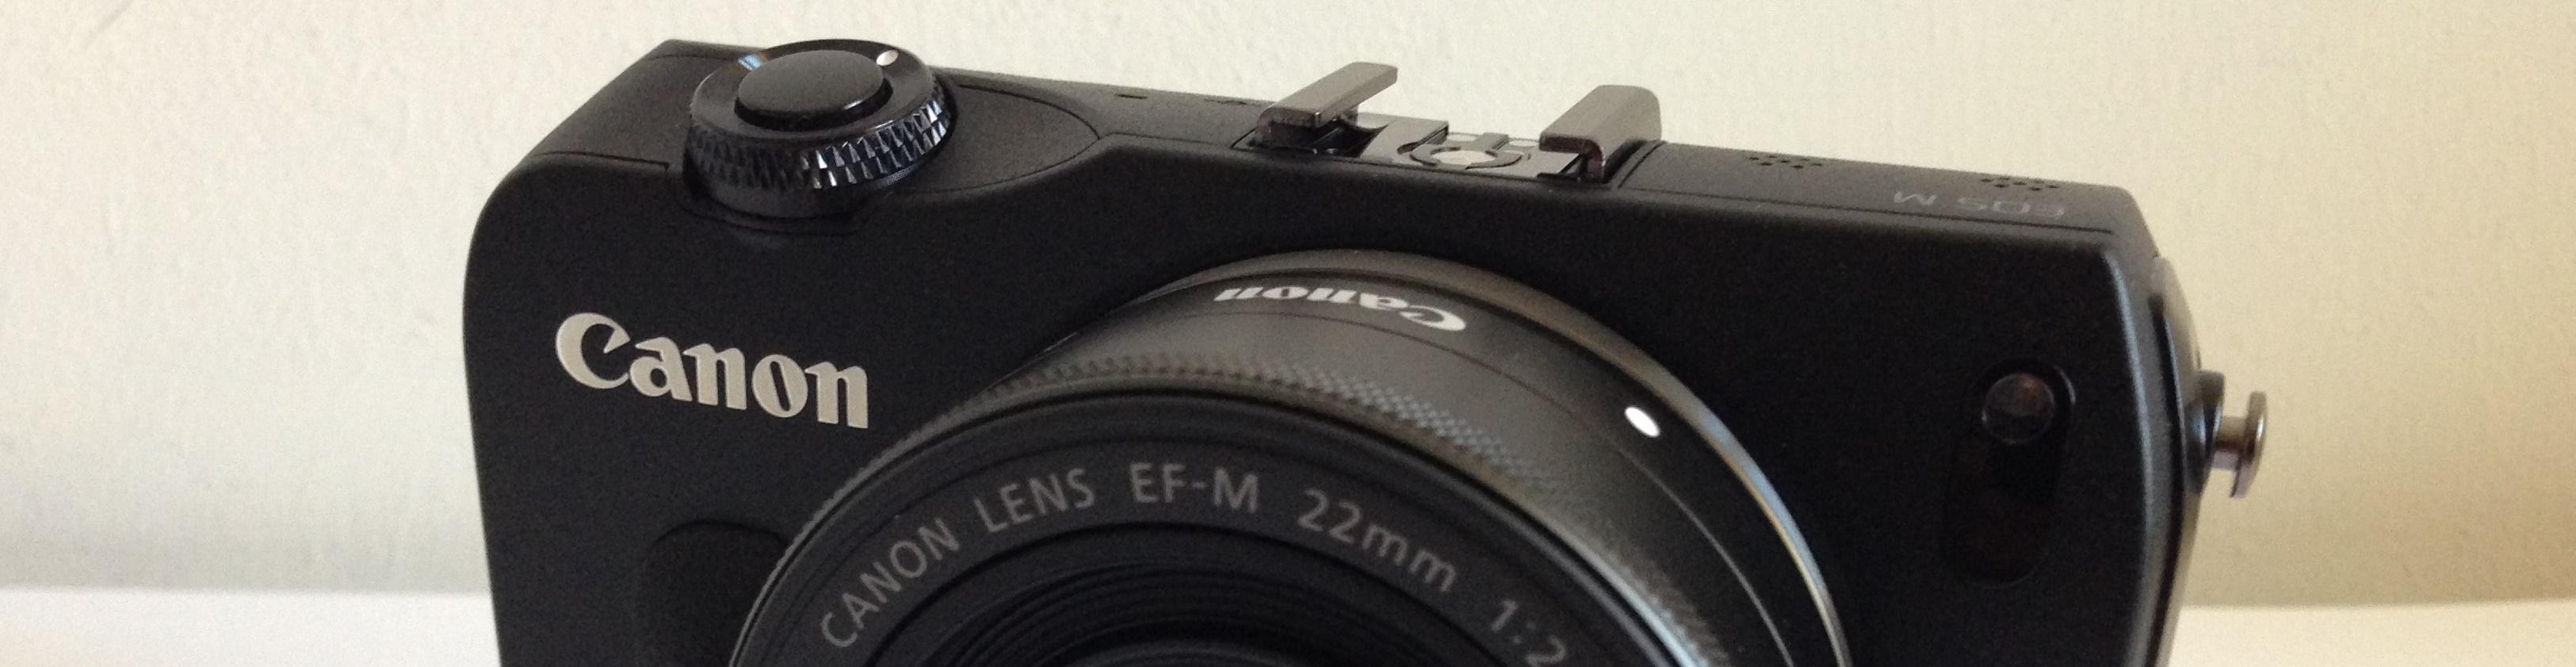 CanonEOSMBeitragsbild2